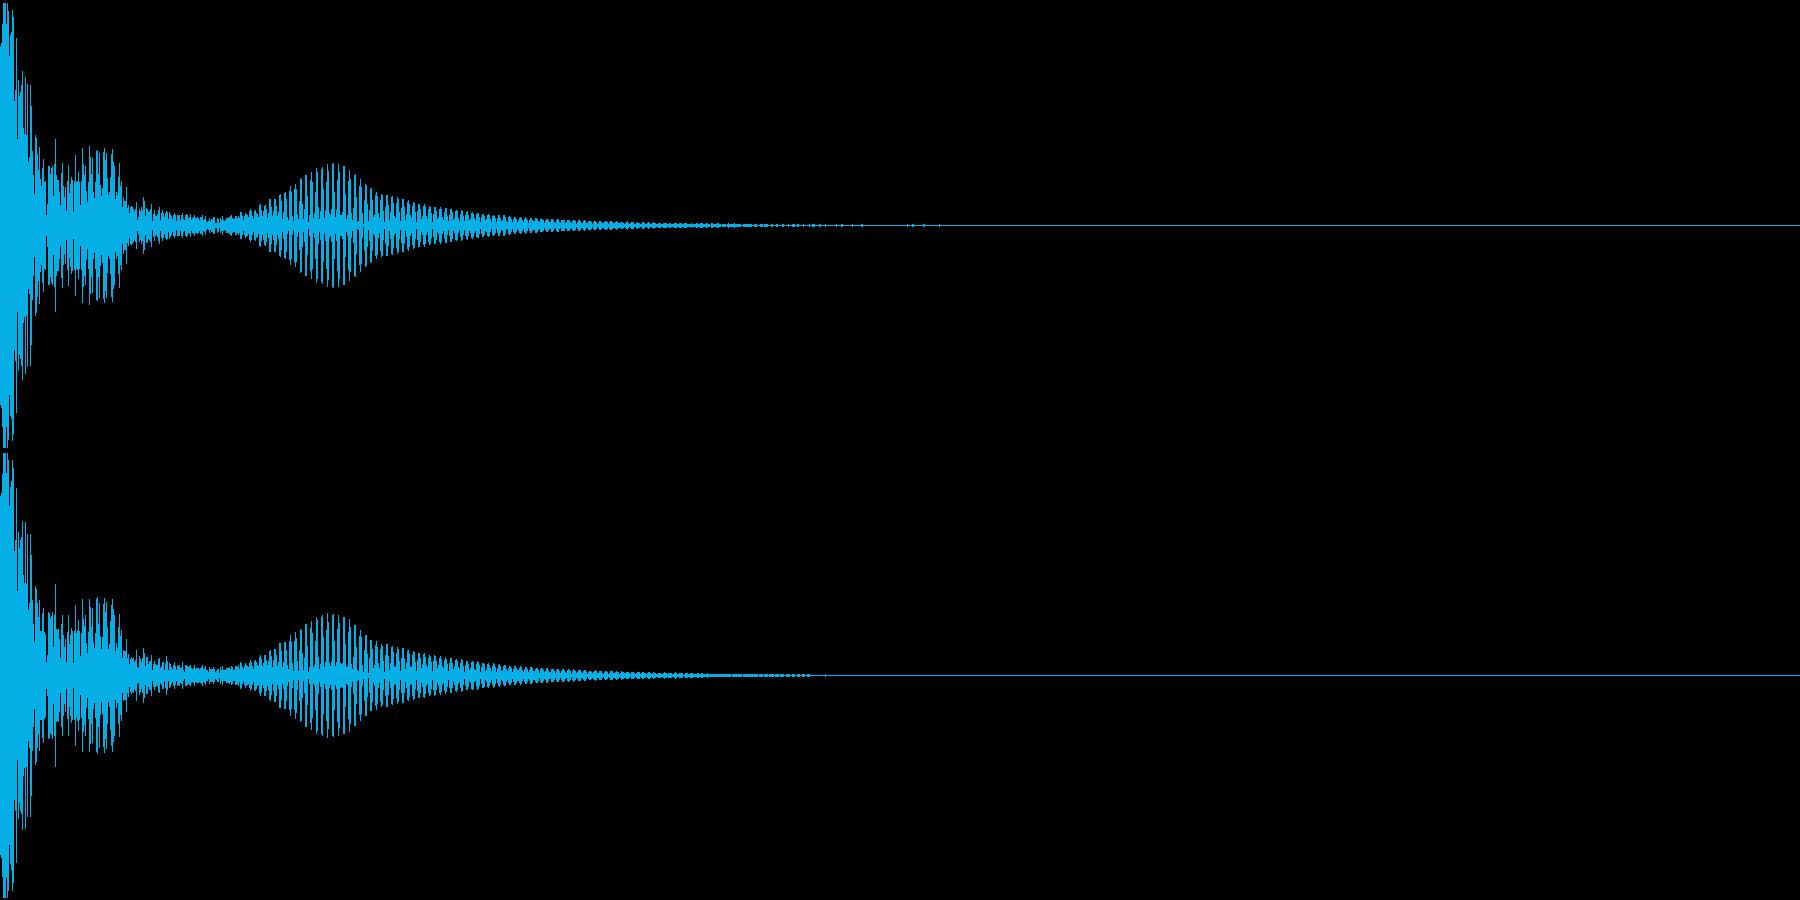 DTM PercFX 2 オリジナル音源の再生済みの波形